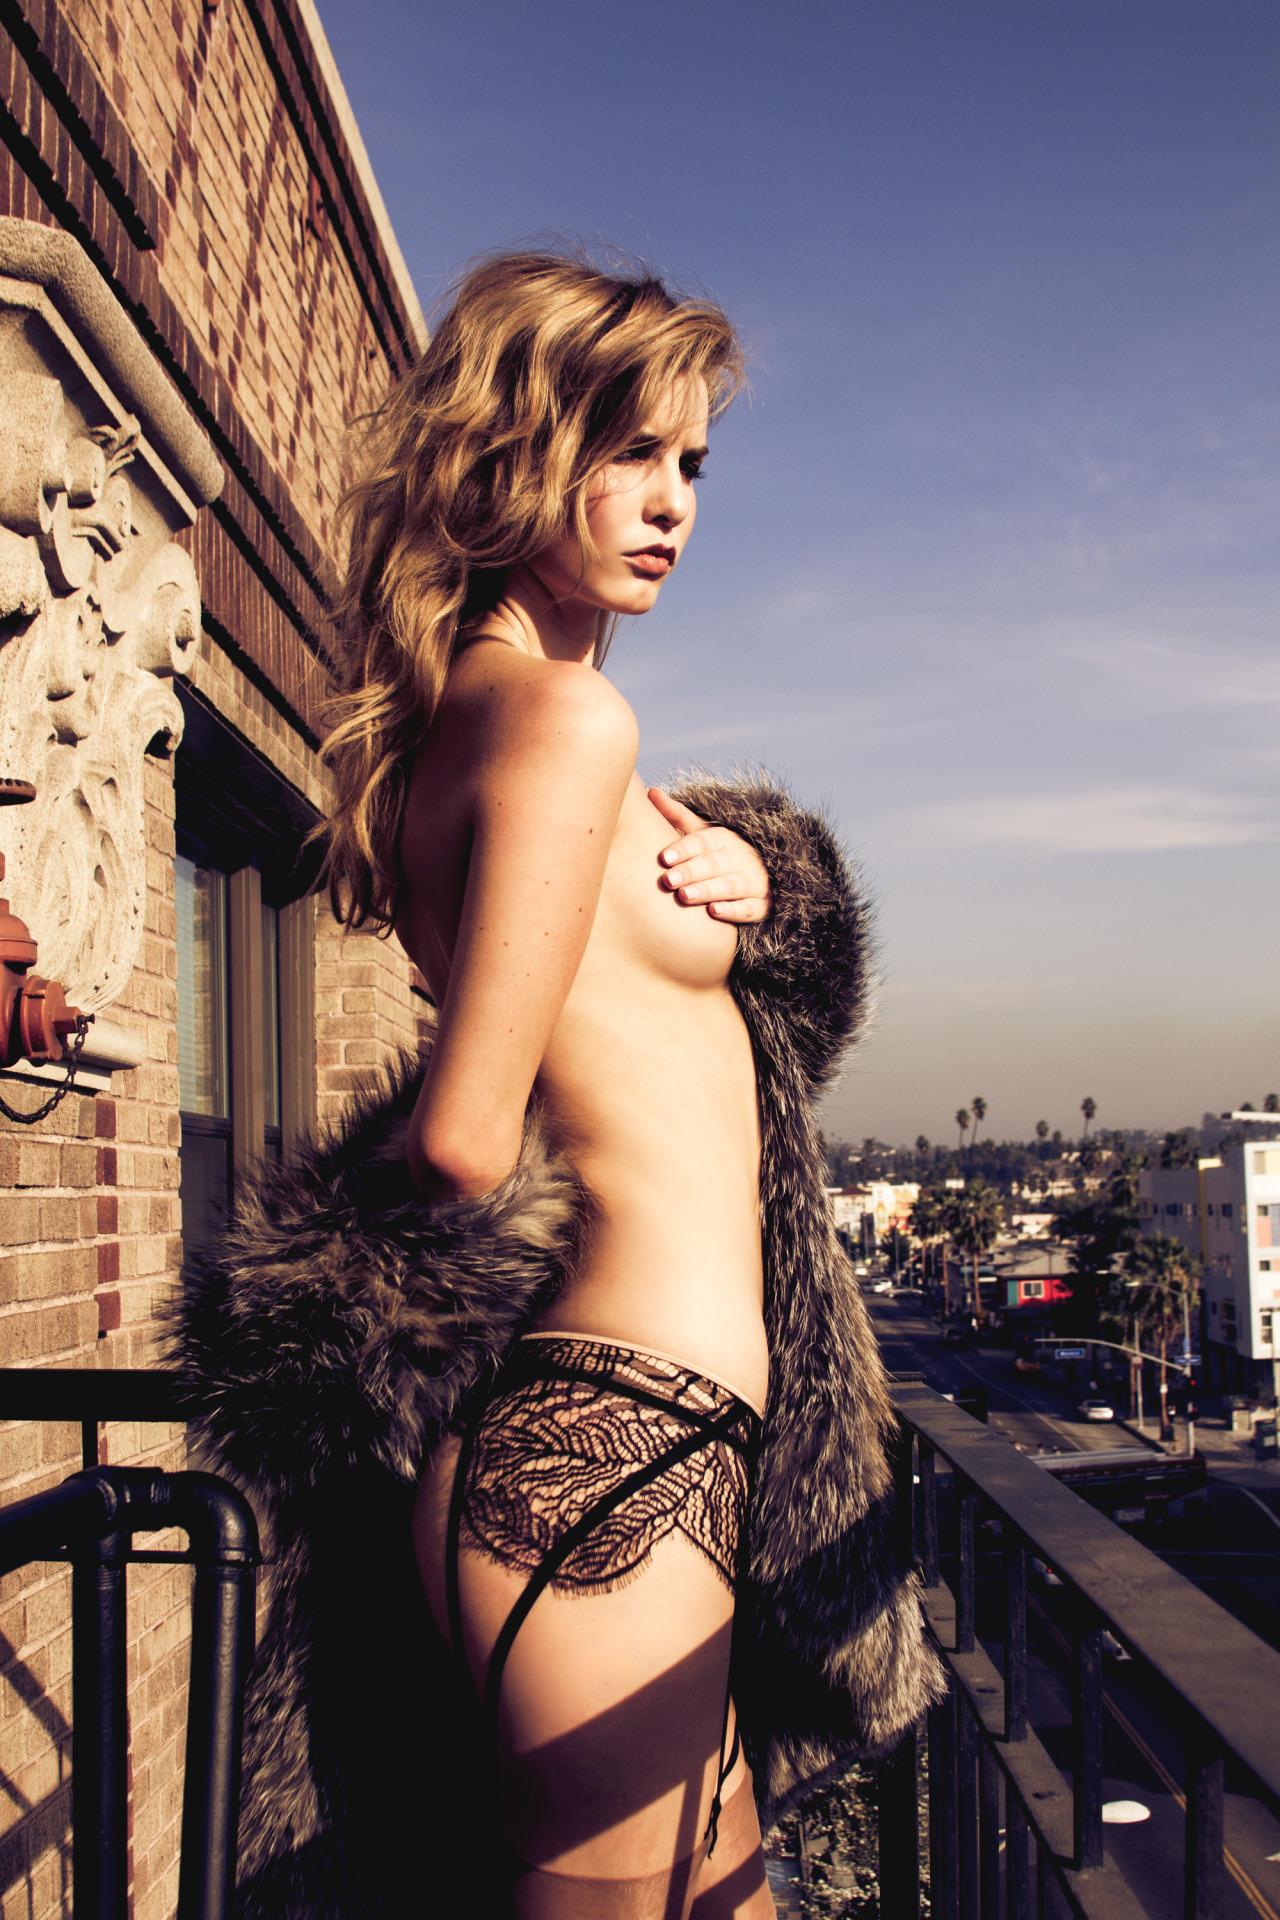 belle blonde topless